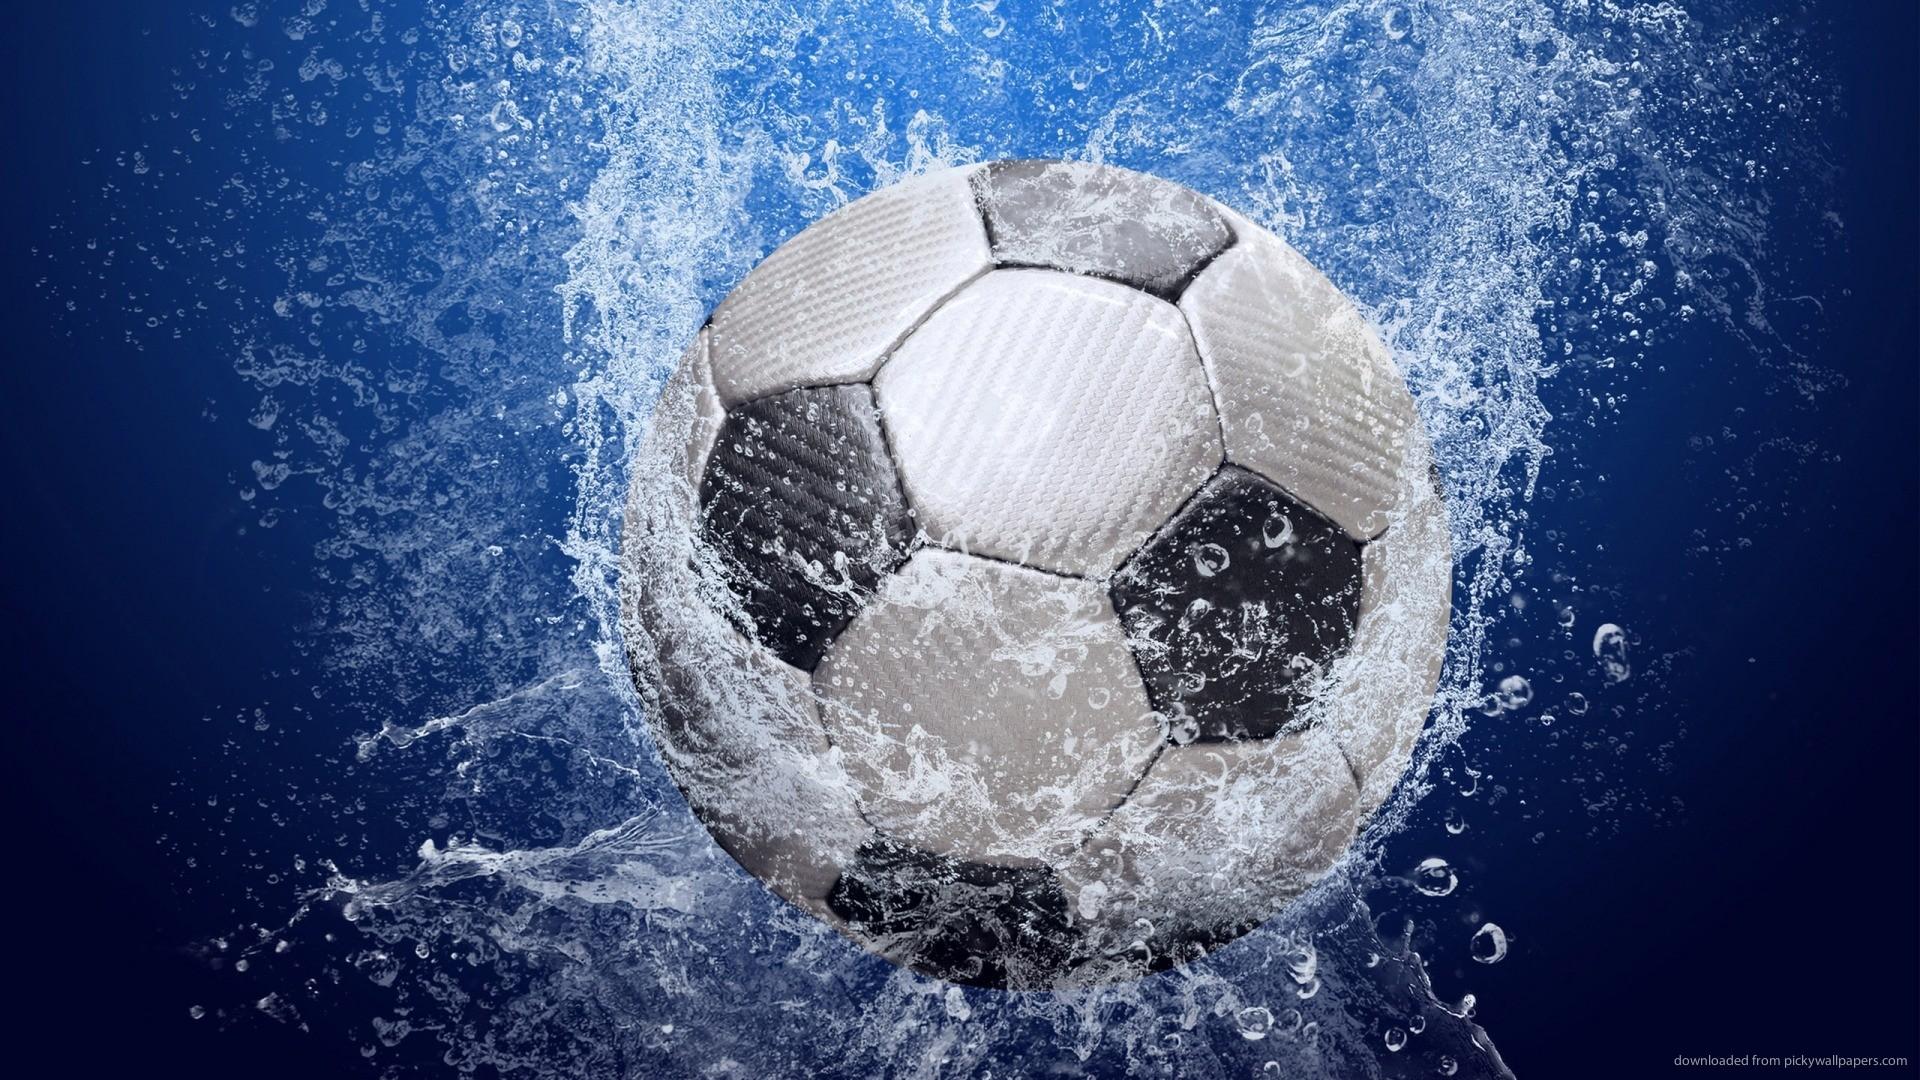 Soccer Balls On Water 4